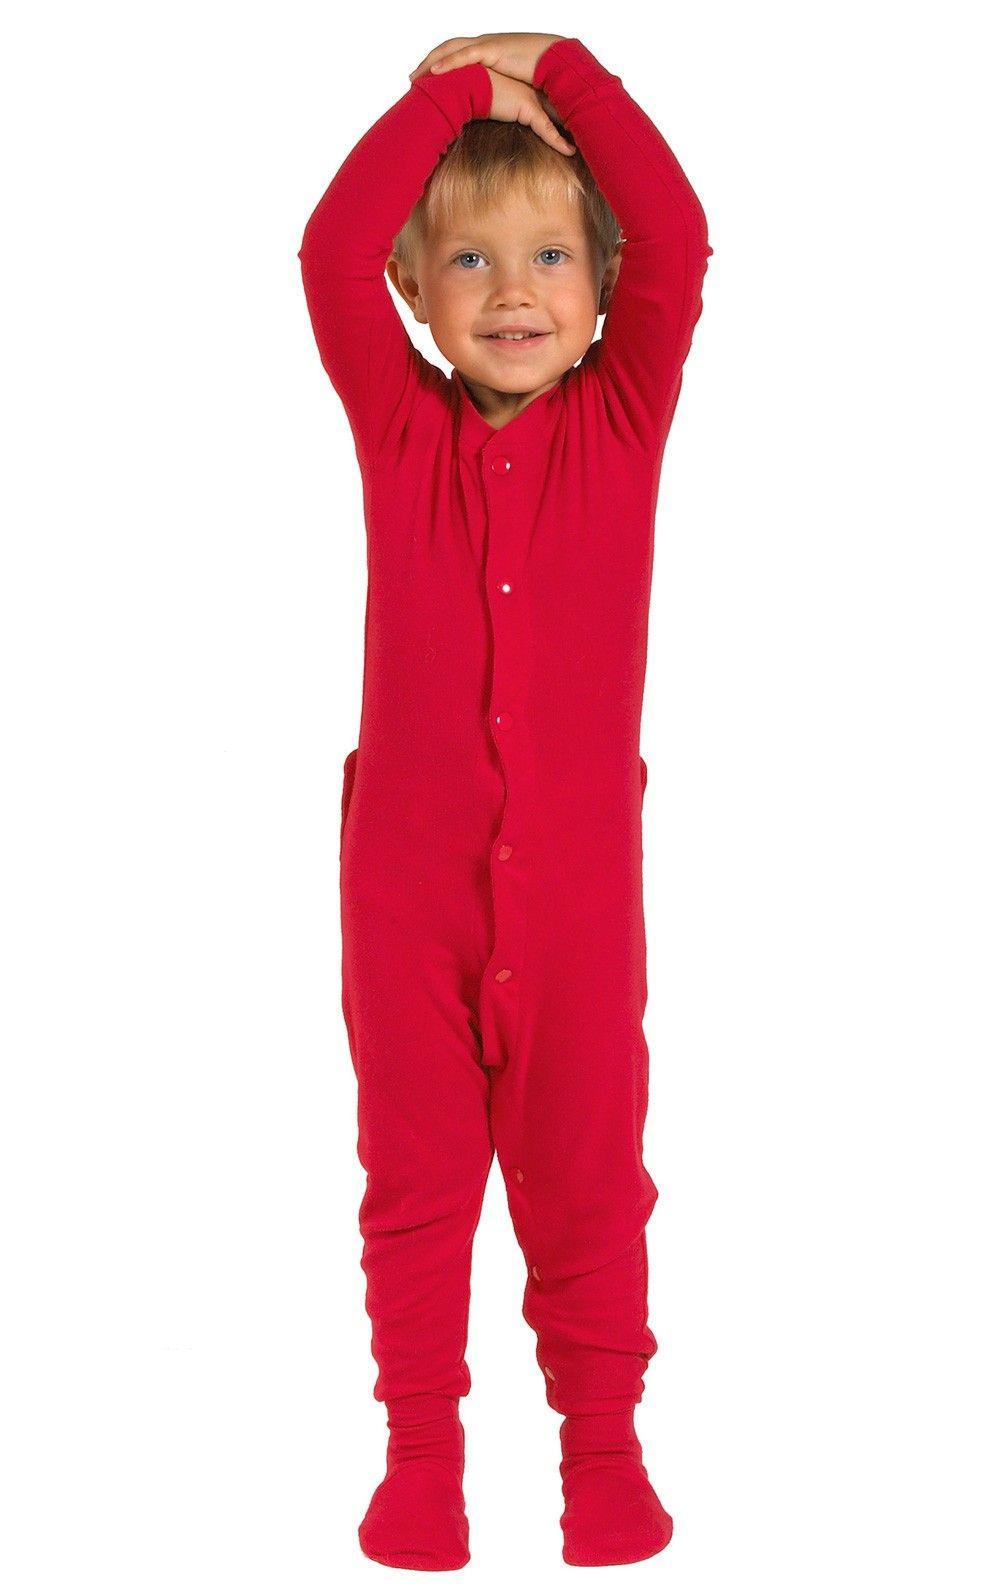 b205901cd403 Red Dropseat Matching Family Pajamas